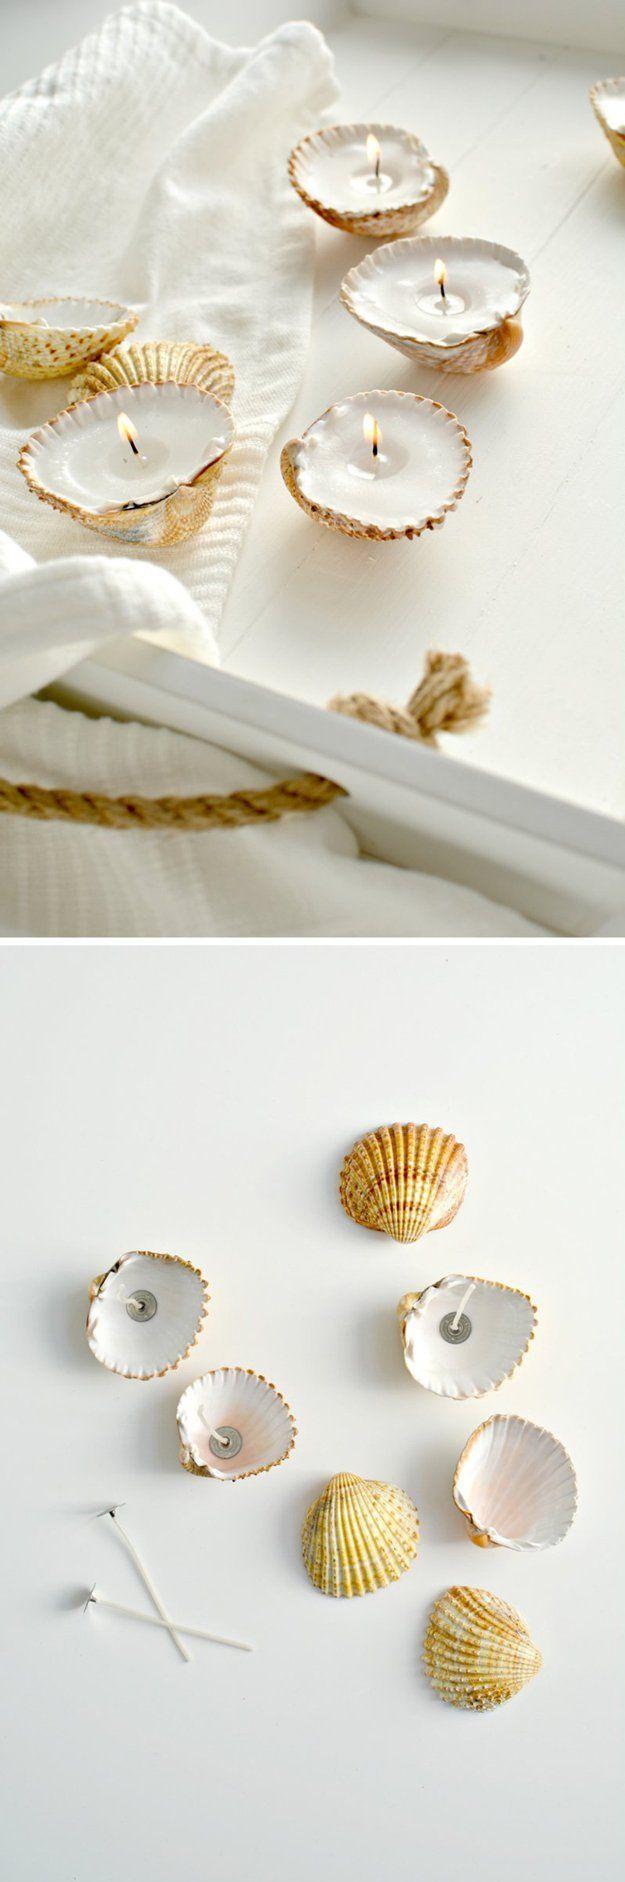 DIY Candle Tutorials for Bathroom Decor | Handmade Shell Candles by DIY Ready at http://diyready.com/bathroom-decorating-ideas-on-a-budget/